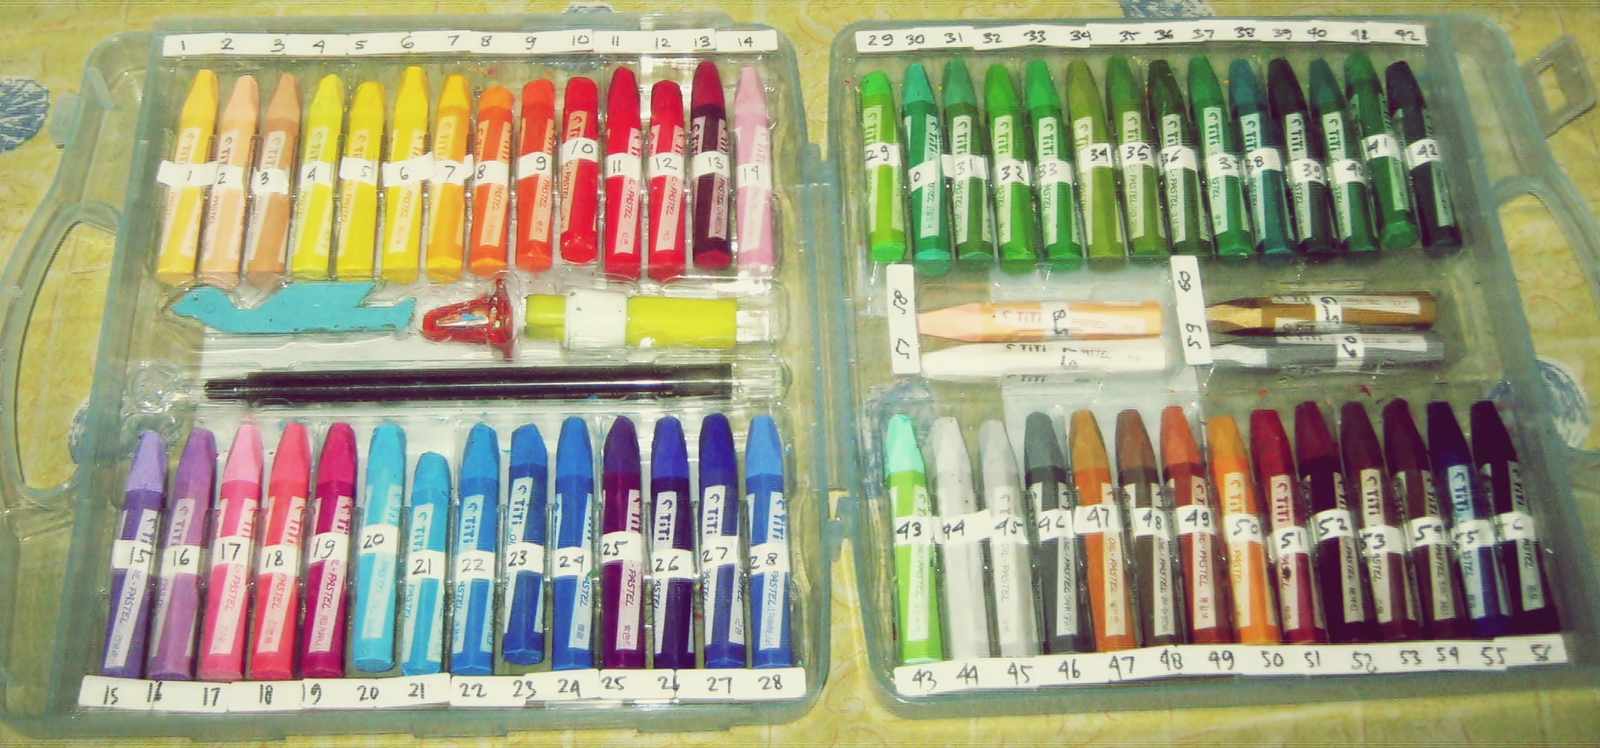 3a tempelkan pula angka yang sama pada bagian atas tempat masing masing batang crayon dimulai dari pinggir kiri juga